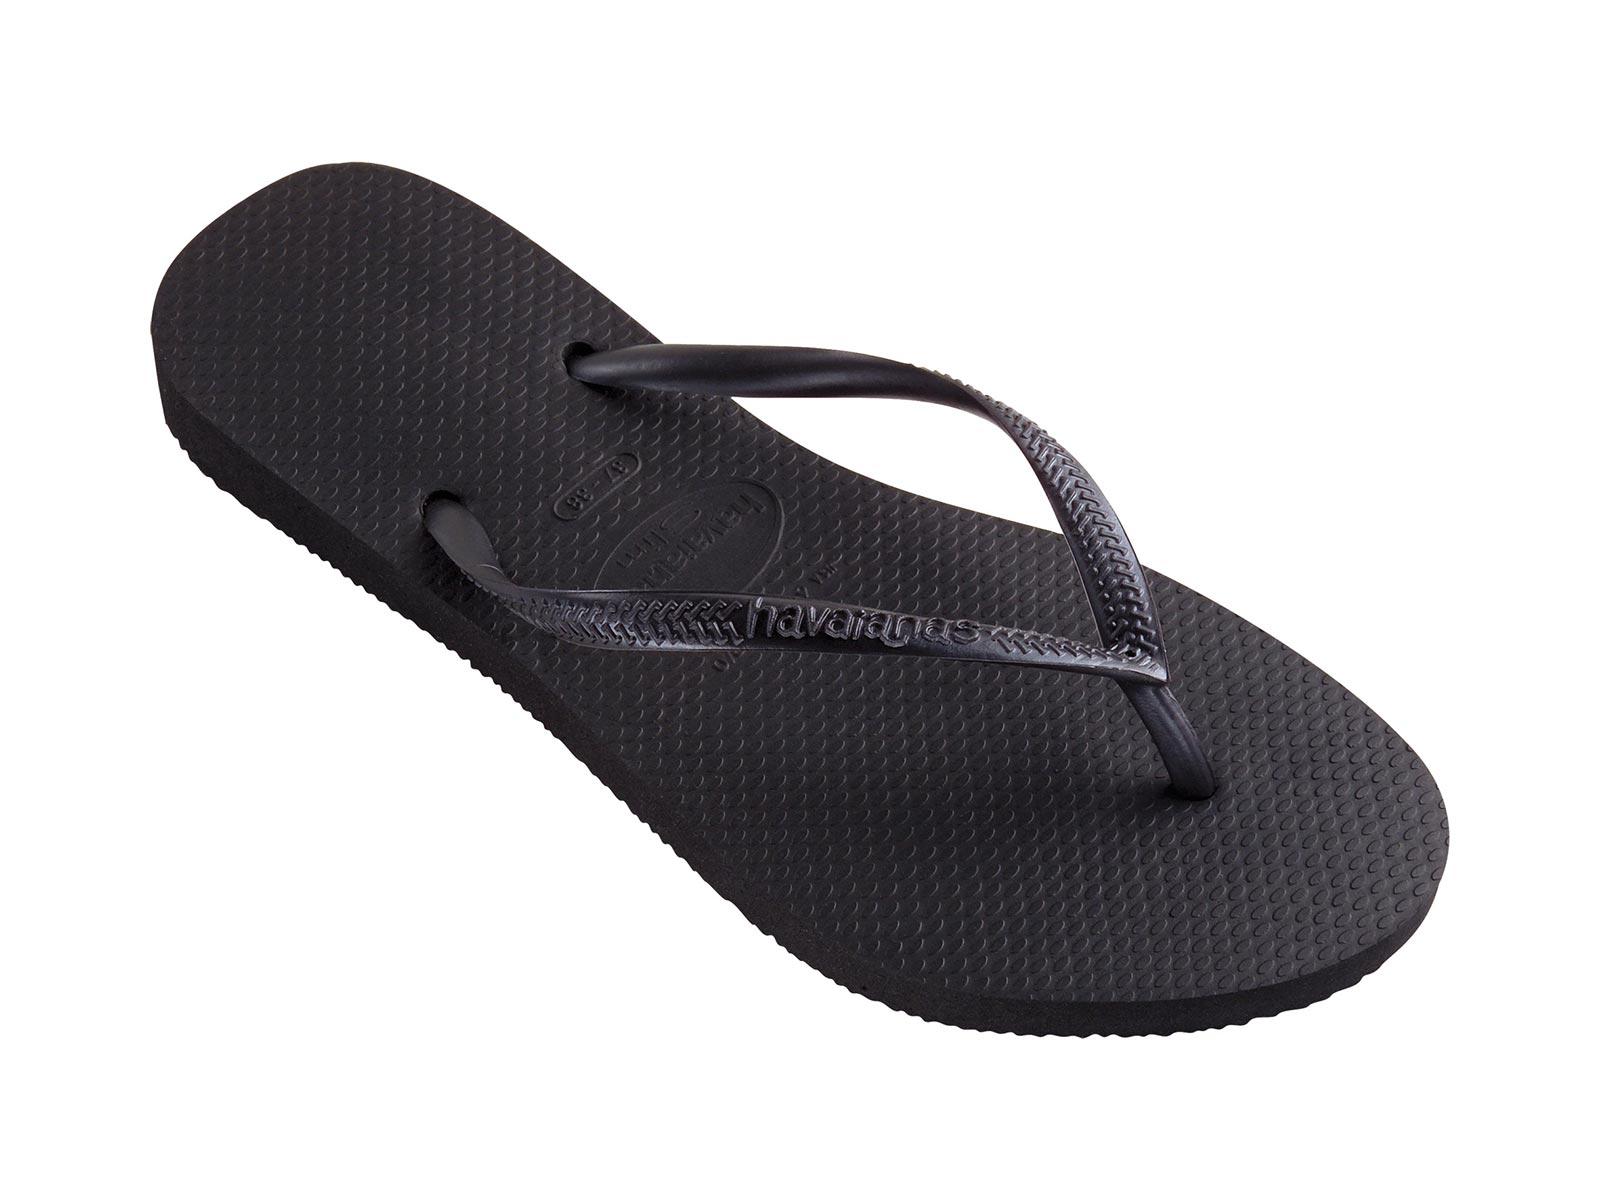 Flip-Flops Flip-flops - Slim Black